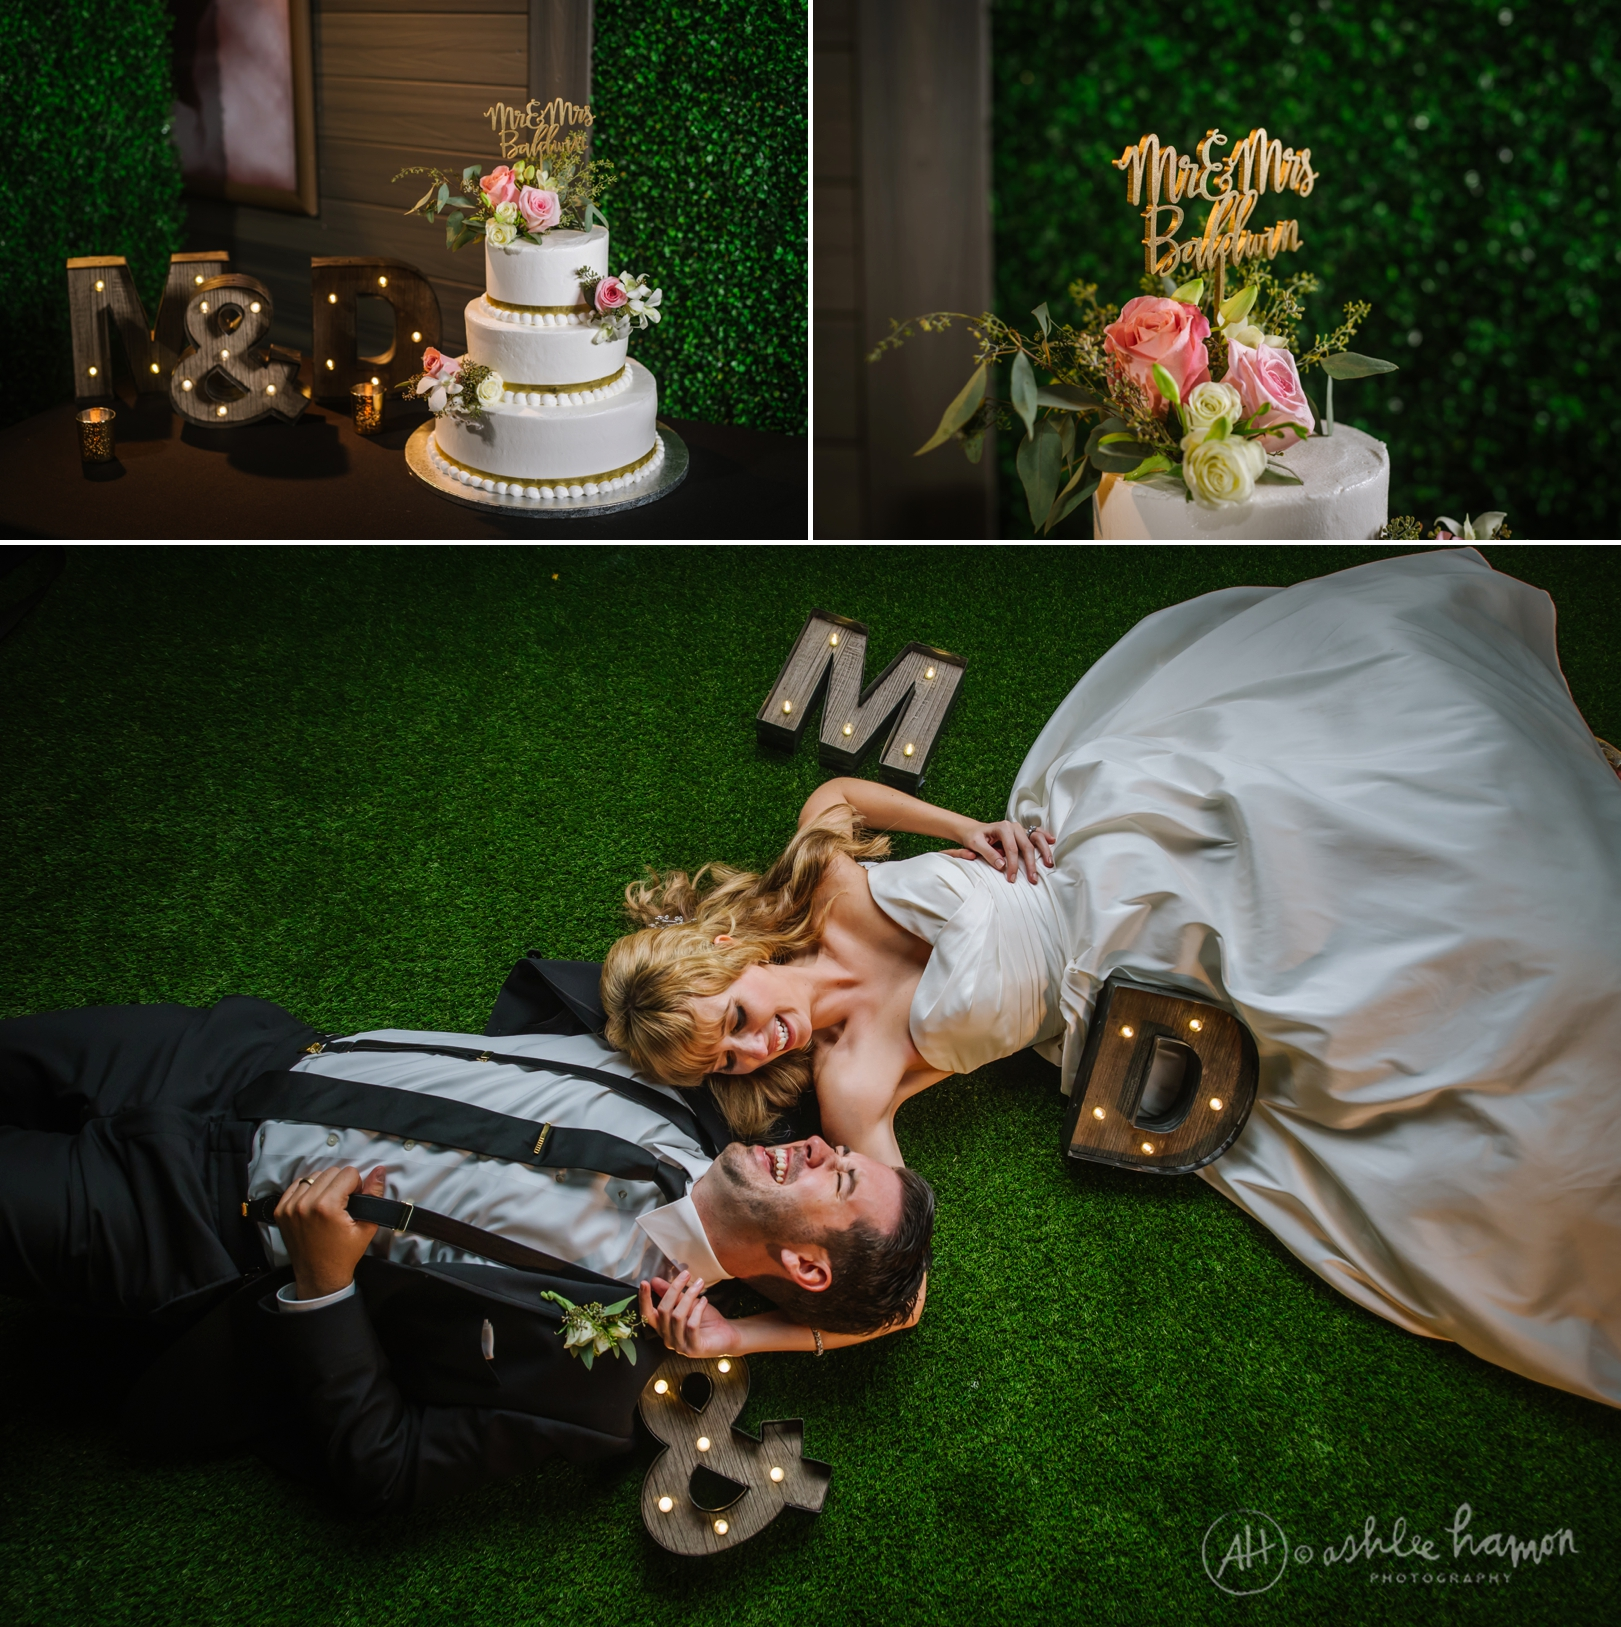 st-pete-hotel-zamora-sunken-gardens-rooftop-wedding-photography_0016.jpg